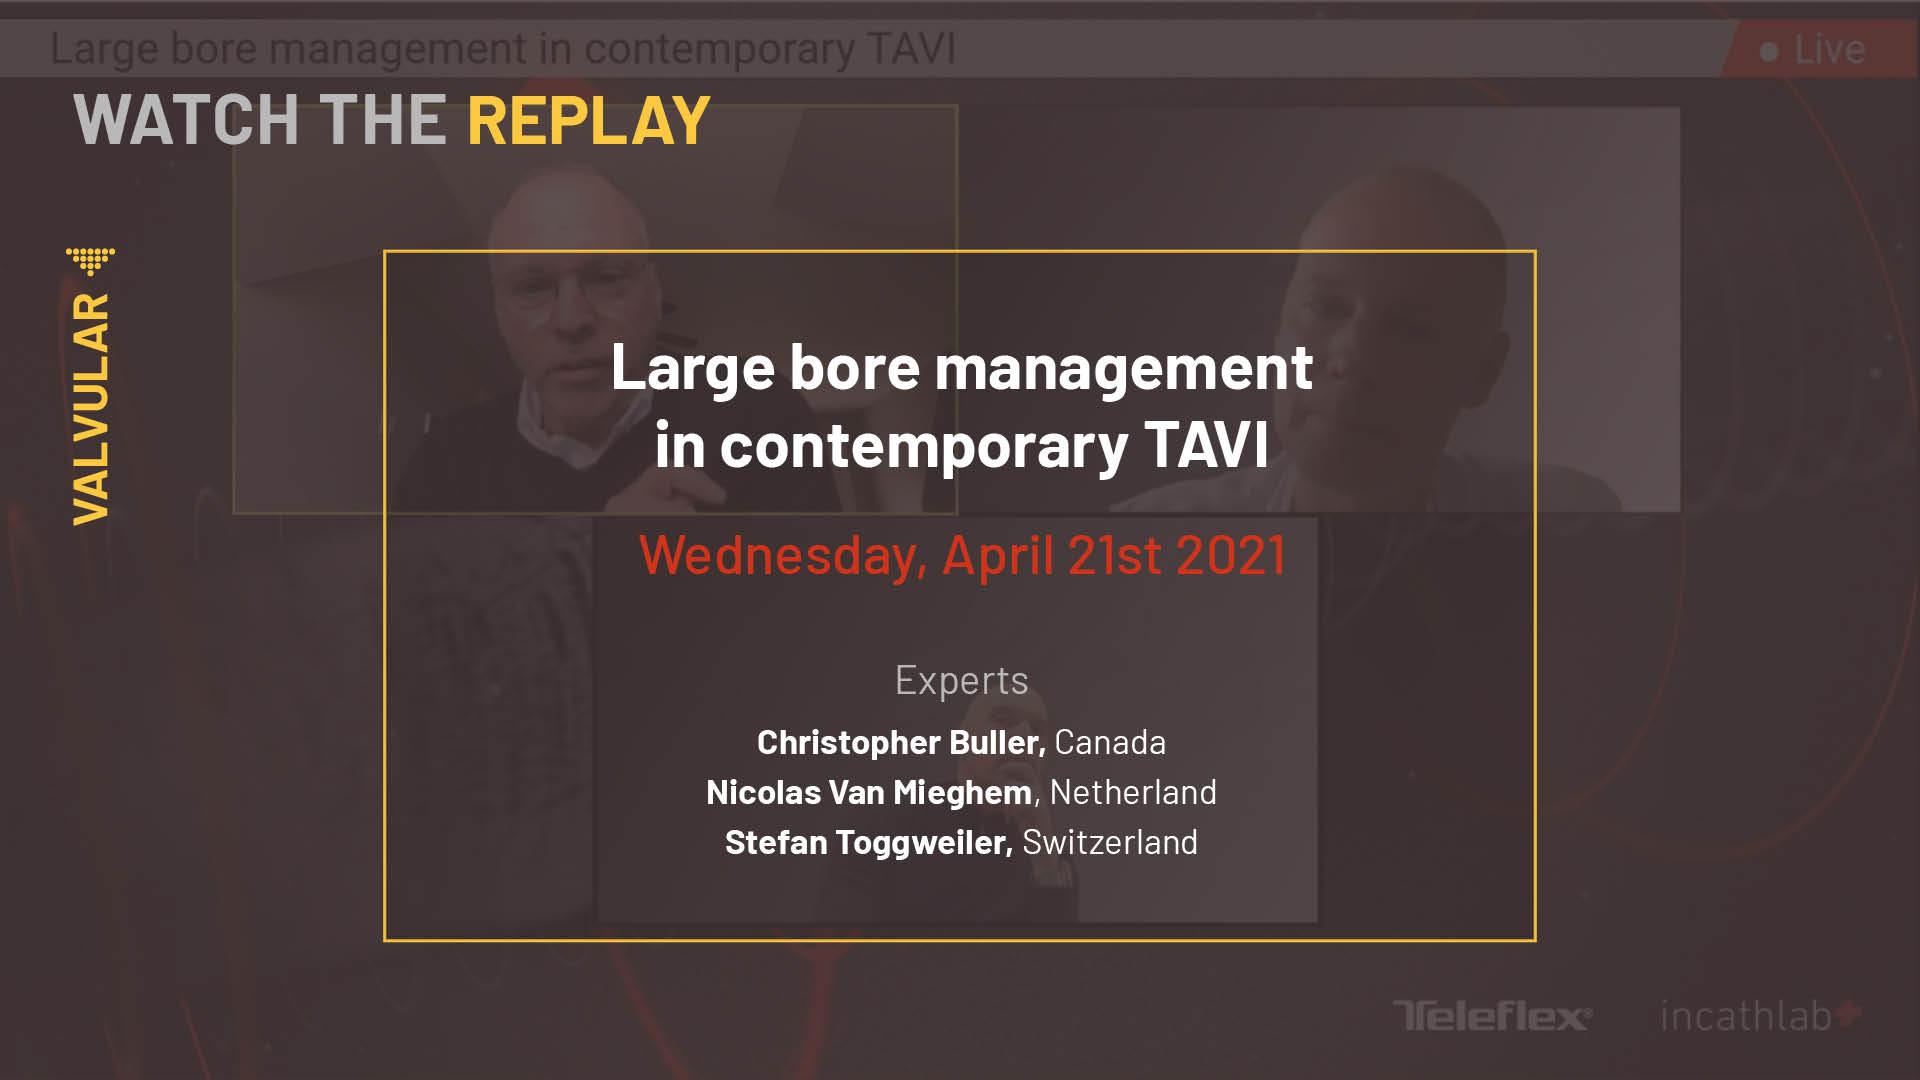 Large bore management in contemporary TAVI